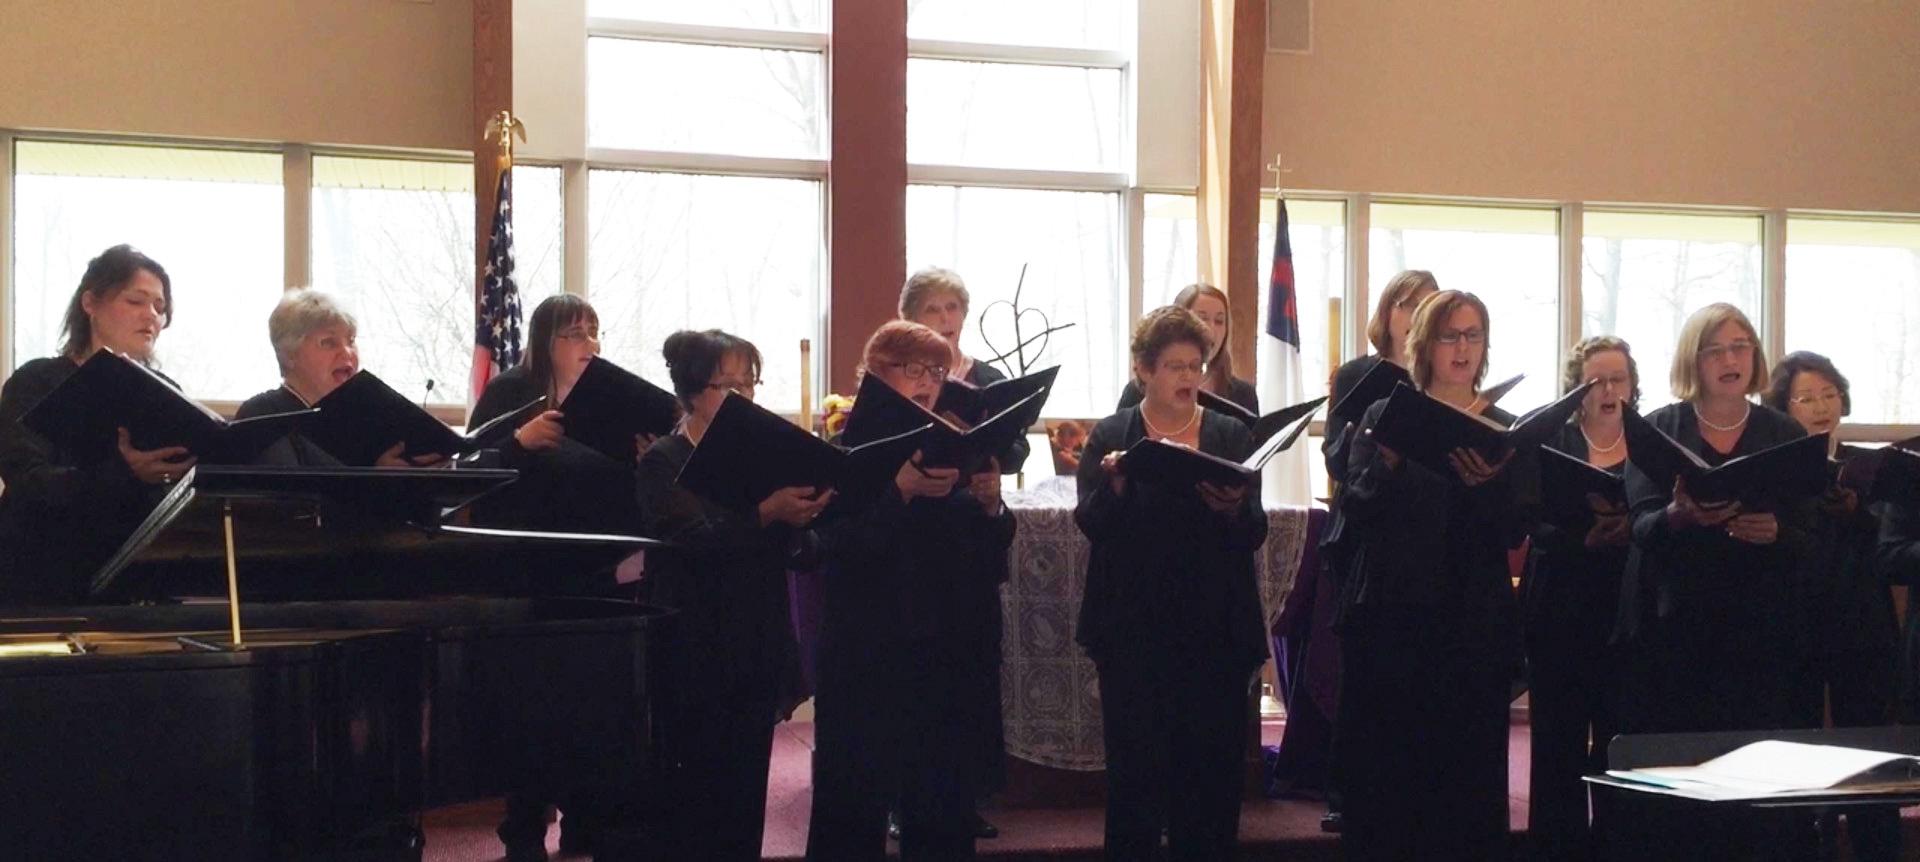 Unitarian Universalist Congregation of Fairfax Spring Concert